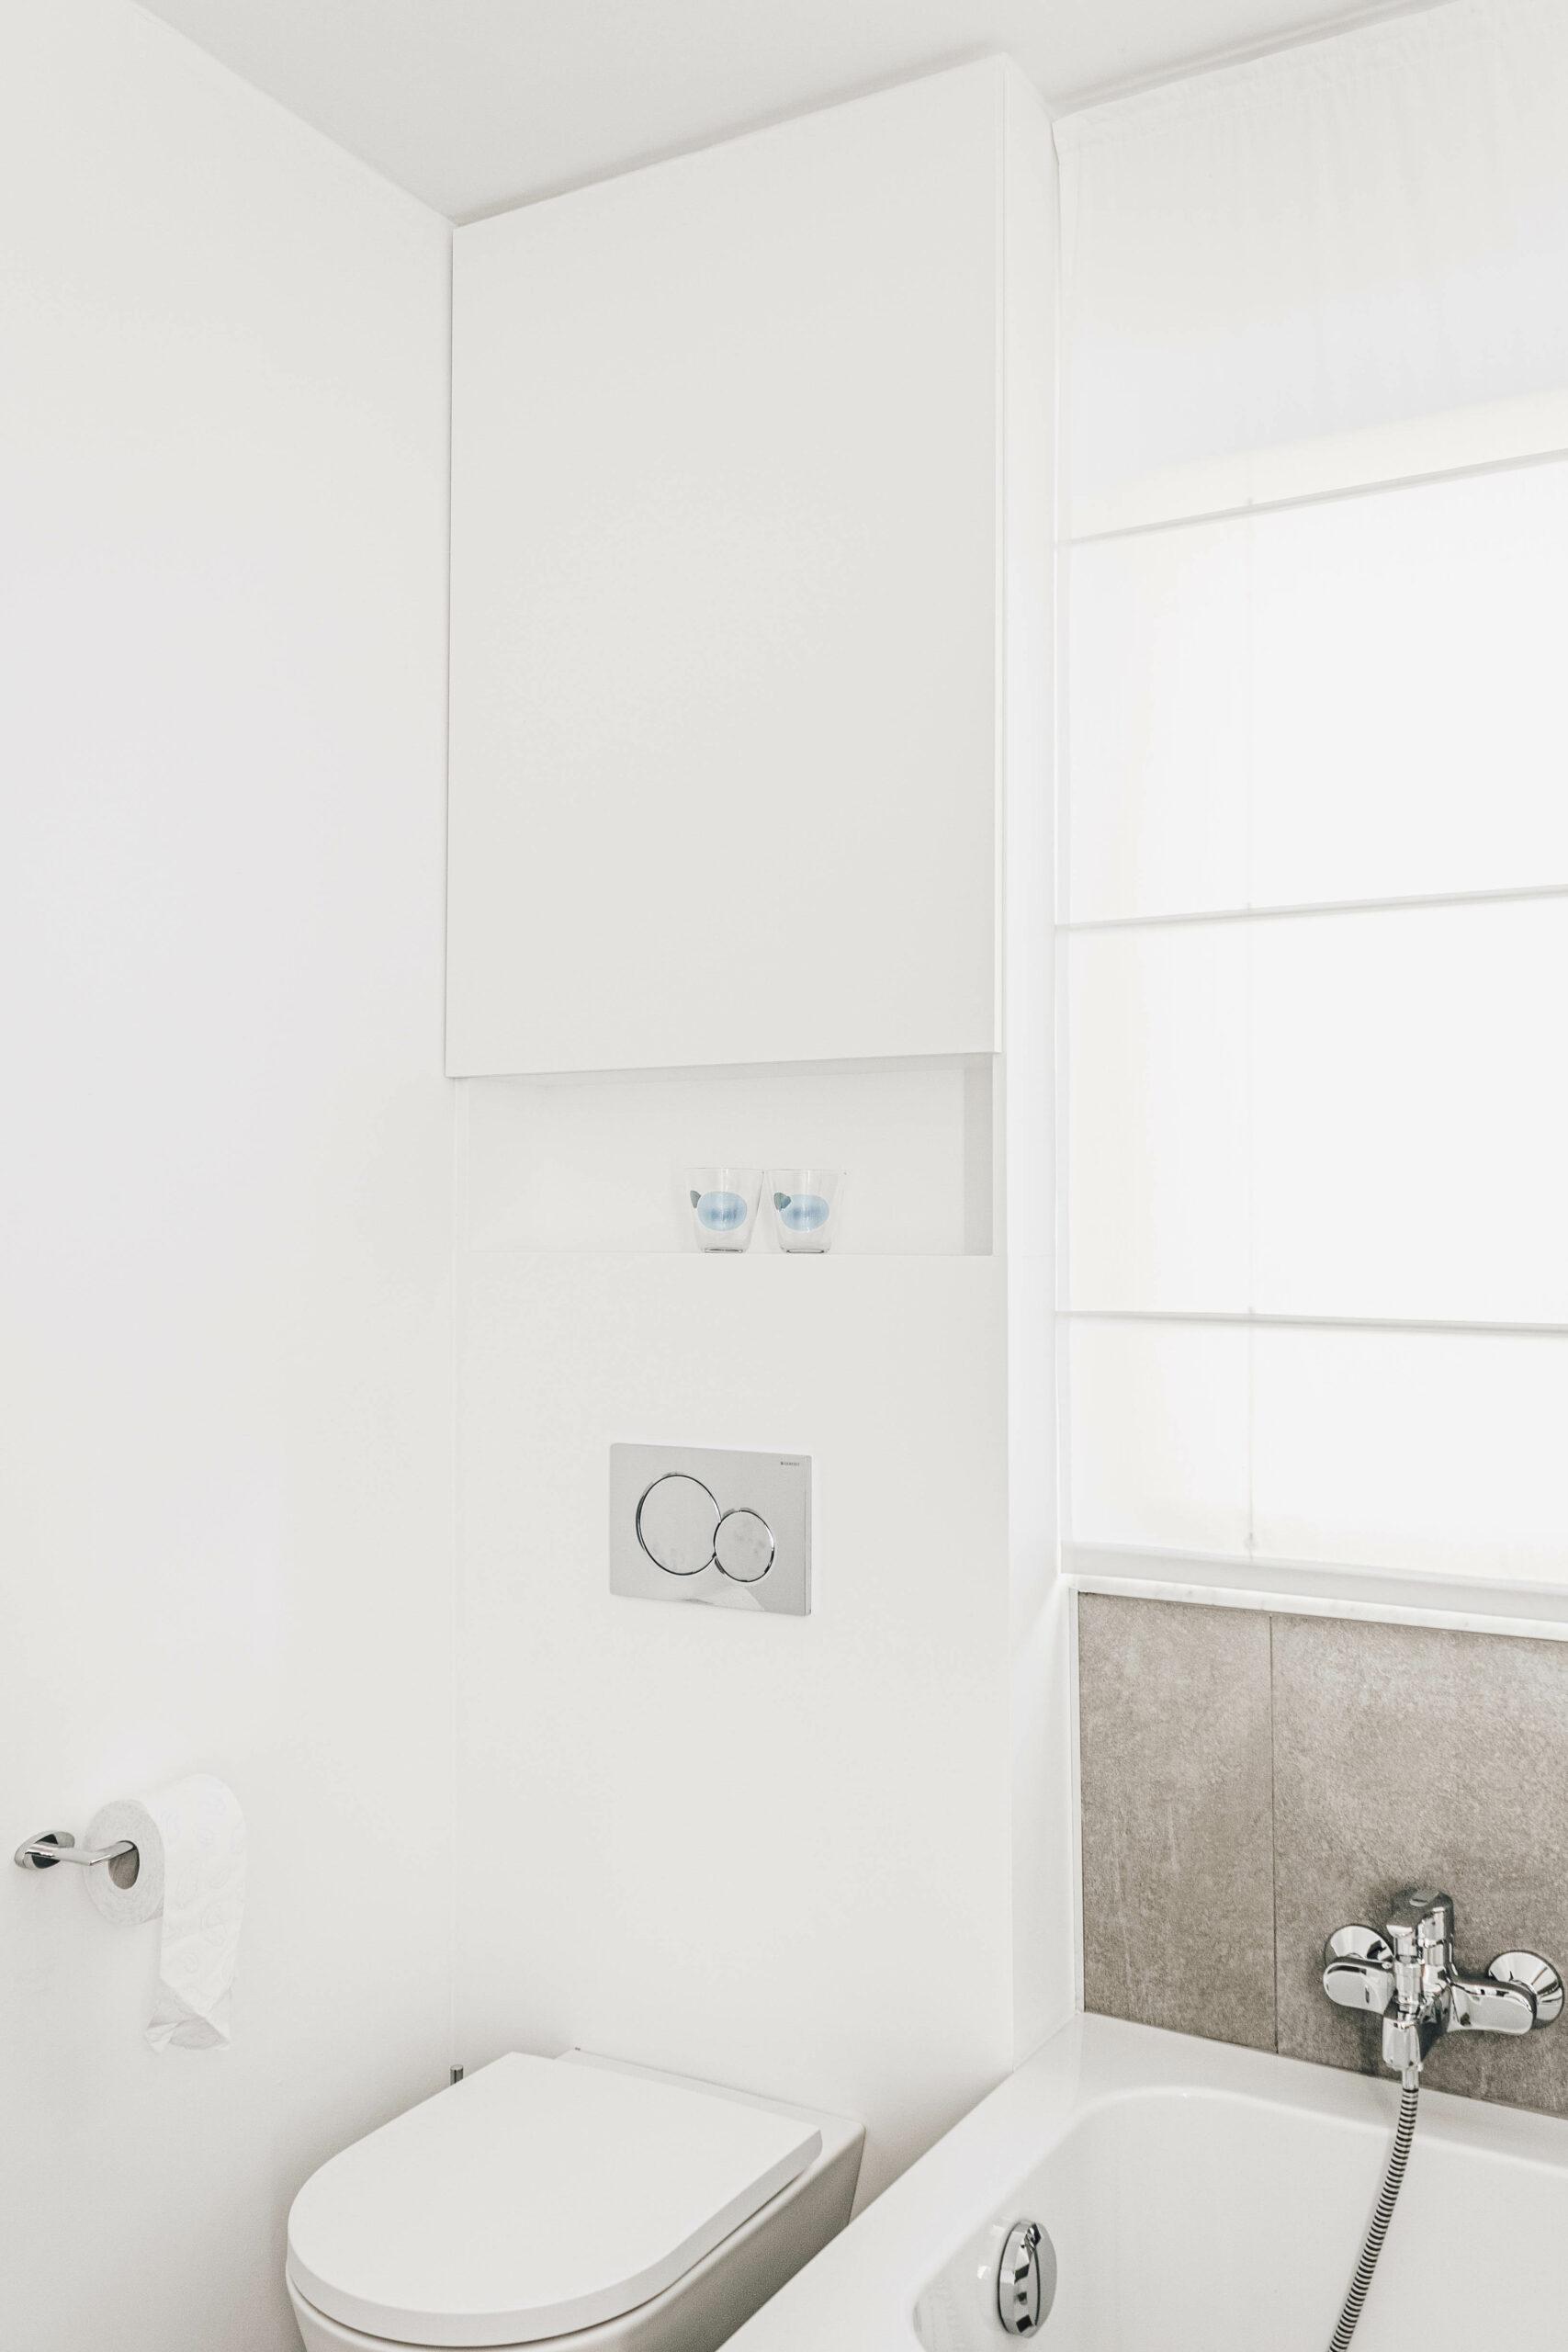 badkamer-renovatie-maatwerk-kasten-interieur-afwerking-sanitair-inloopdouche-bad